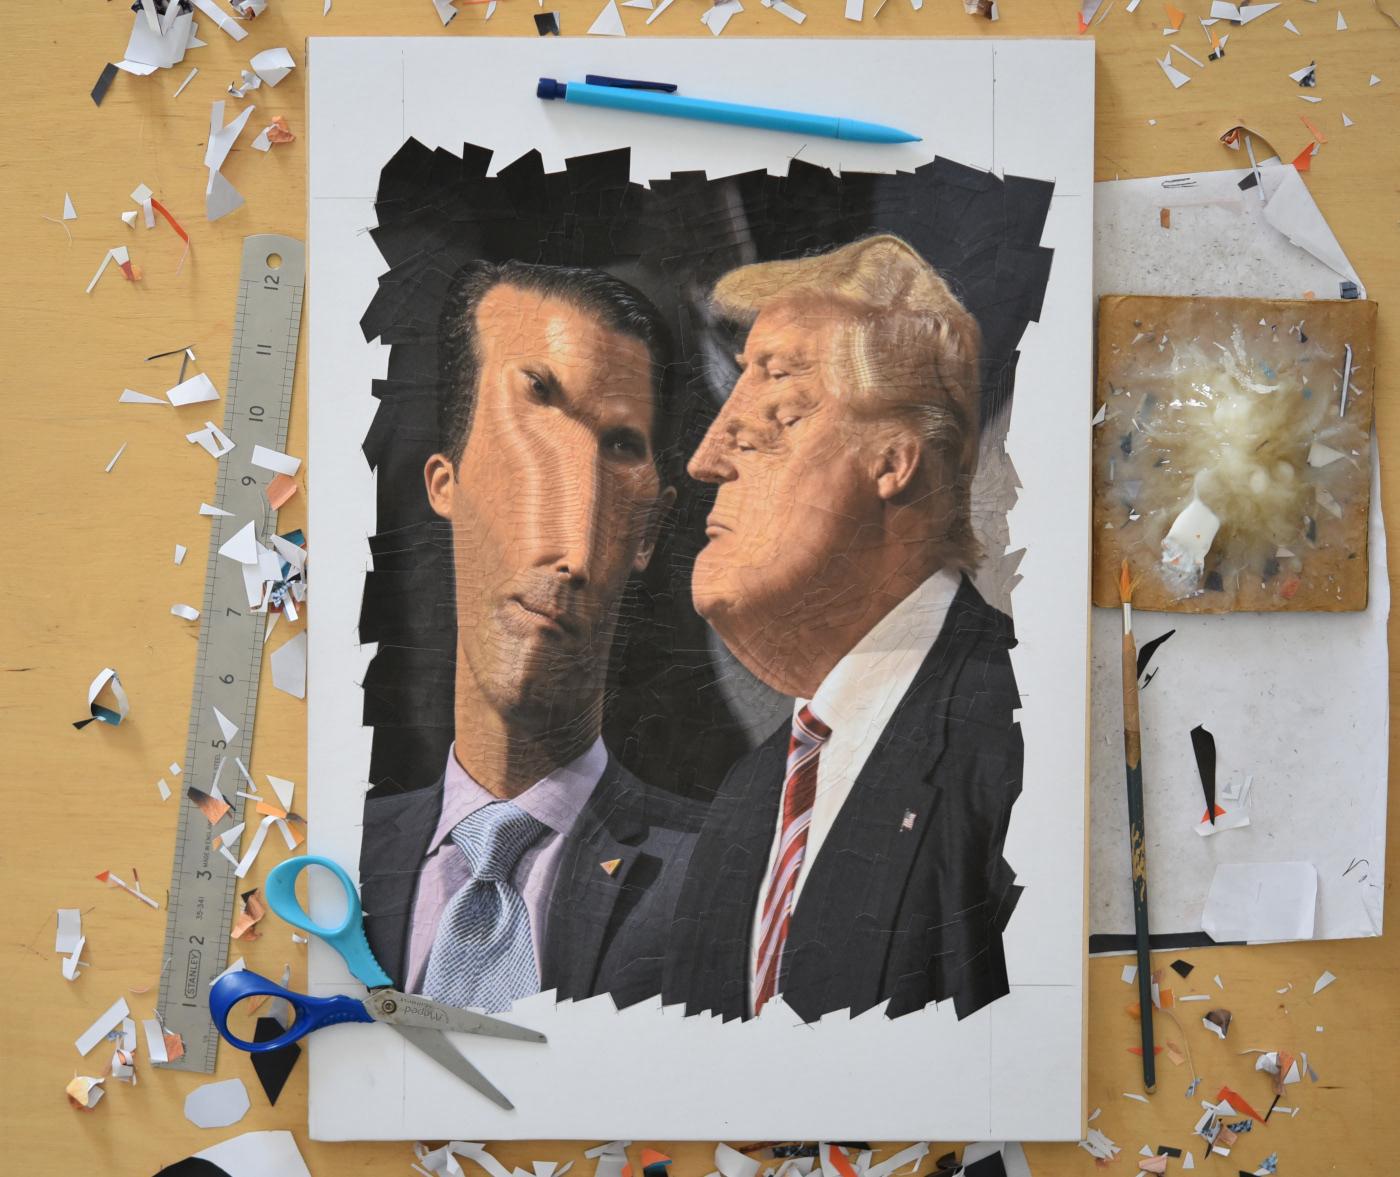 collage paper paper collage portrait surreal surrealism Trump trumpism